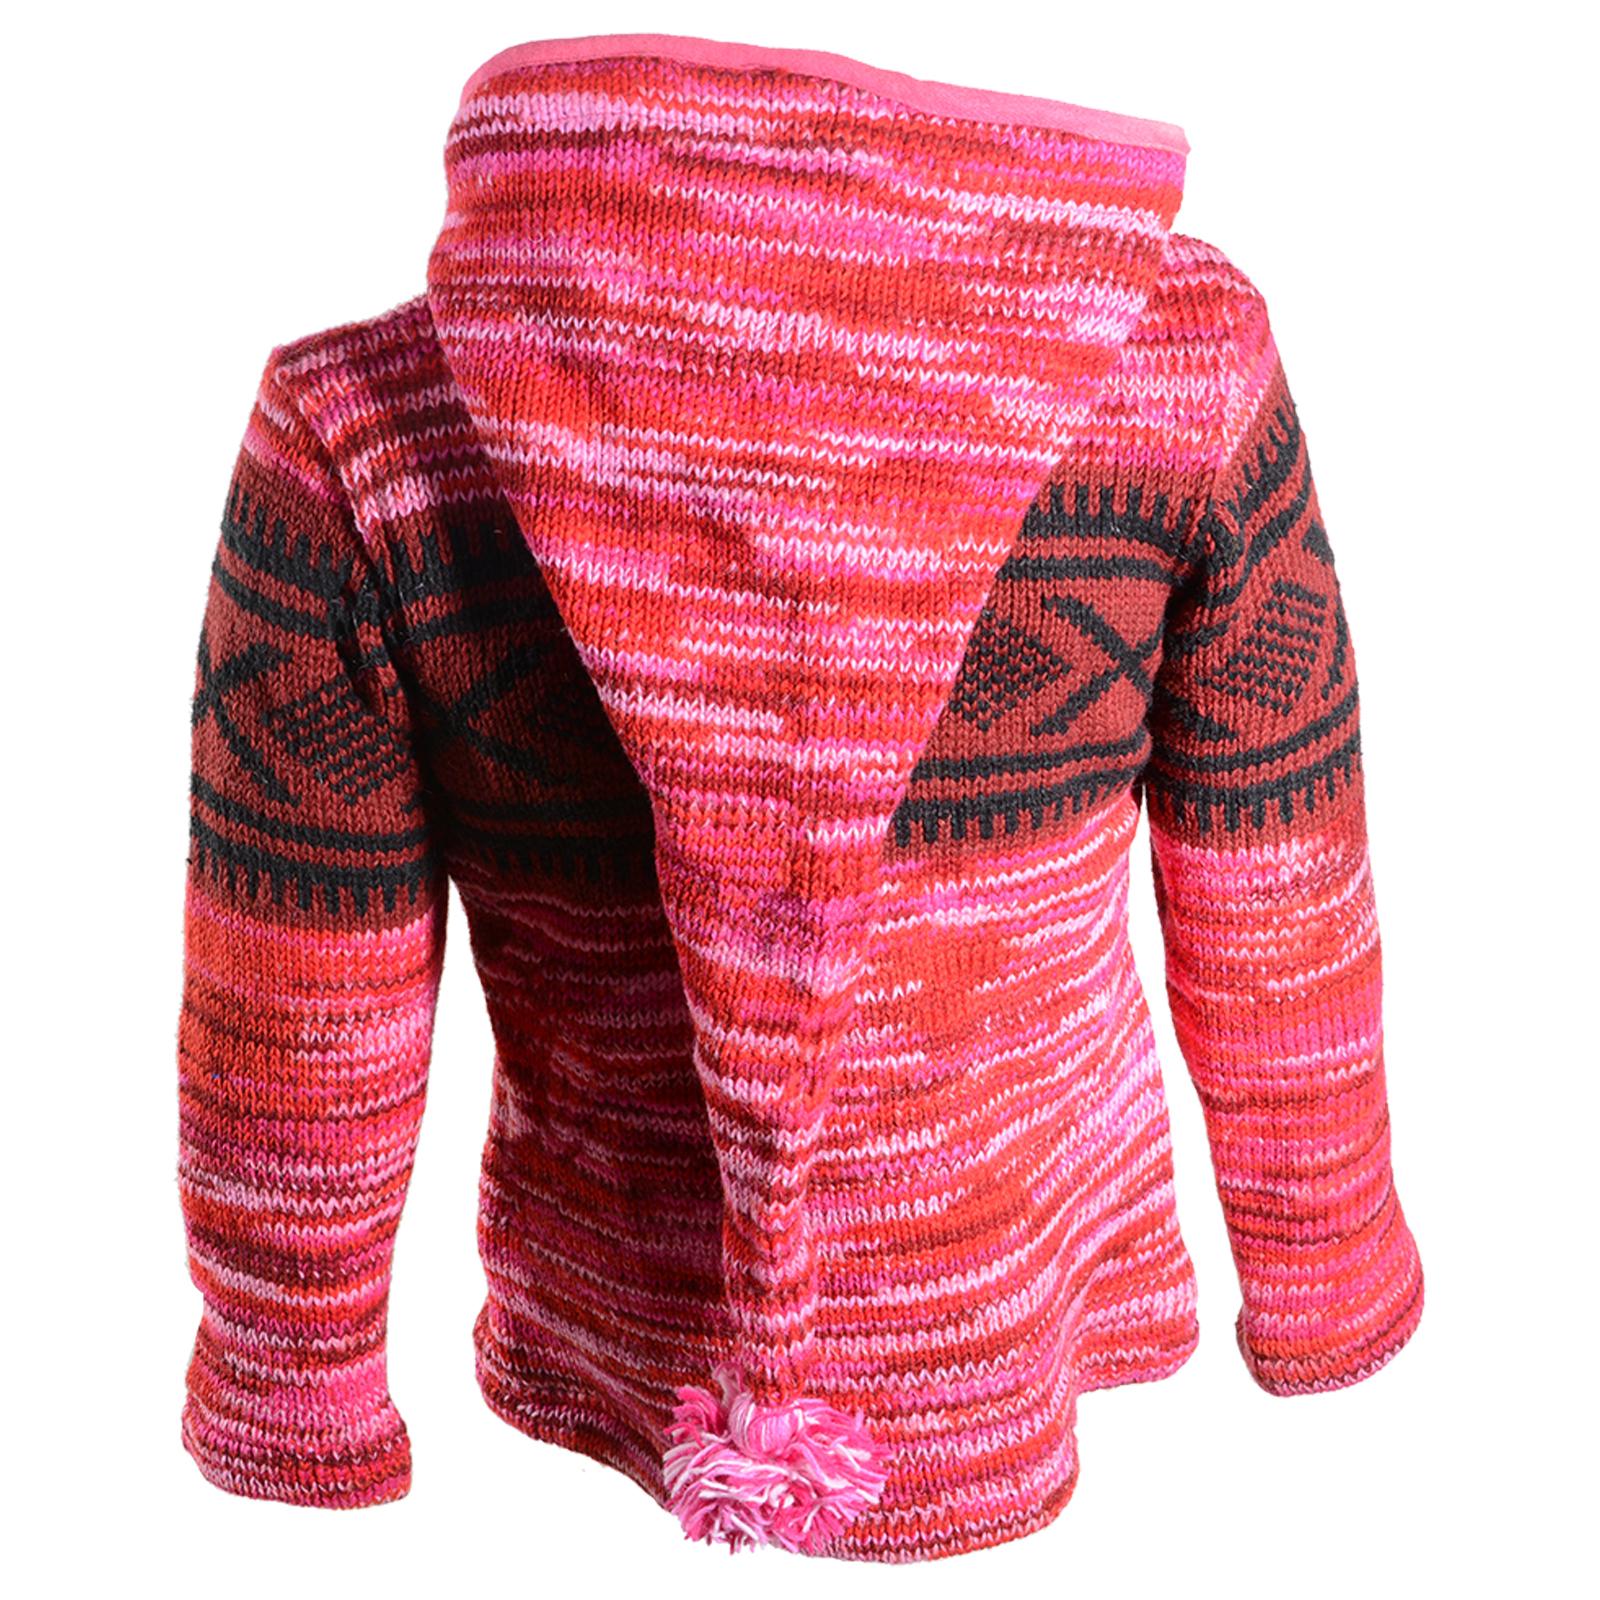 2f6ea3917317 Hippie Goa Nepal Strickjacke Poncho Woll-Pullover in Pink mit abnehmbarer  Zipfelkapuze – Bild